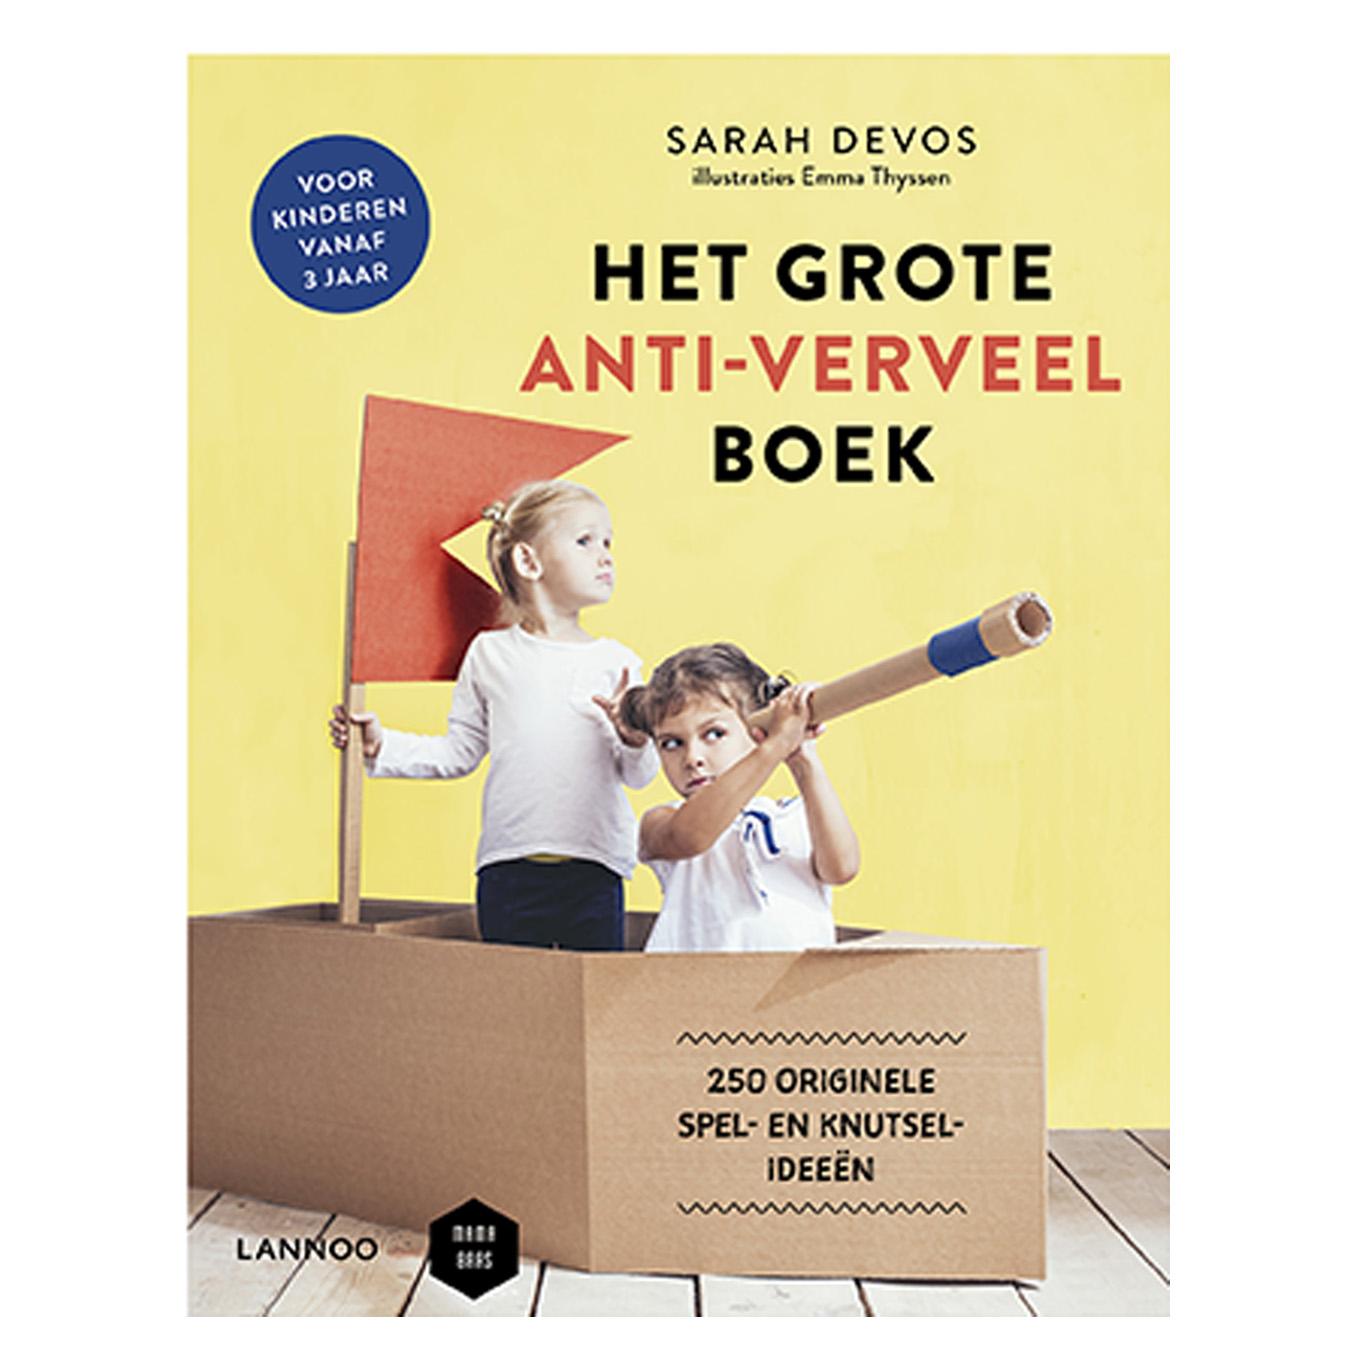 het-grote-anti-verveelboek-lannoo-sarah-devos-mama-baas-emma-thyssen